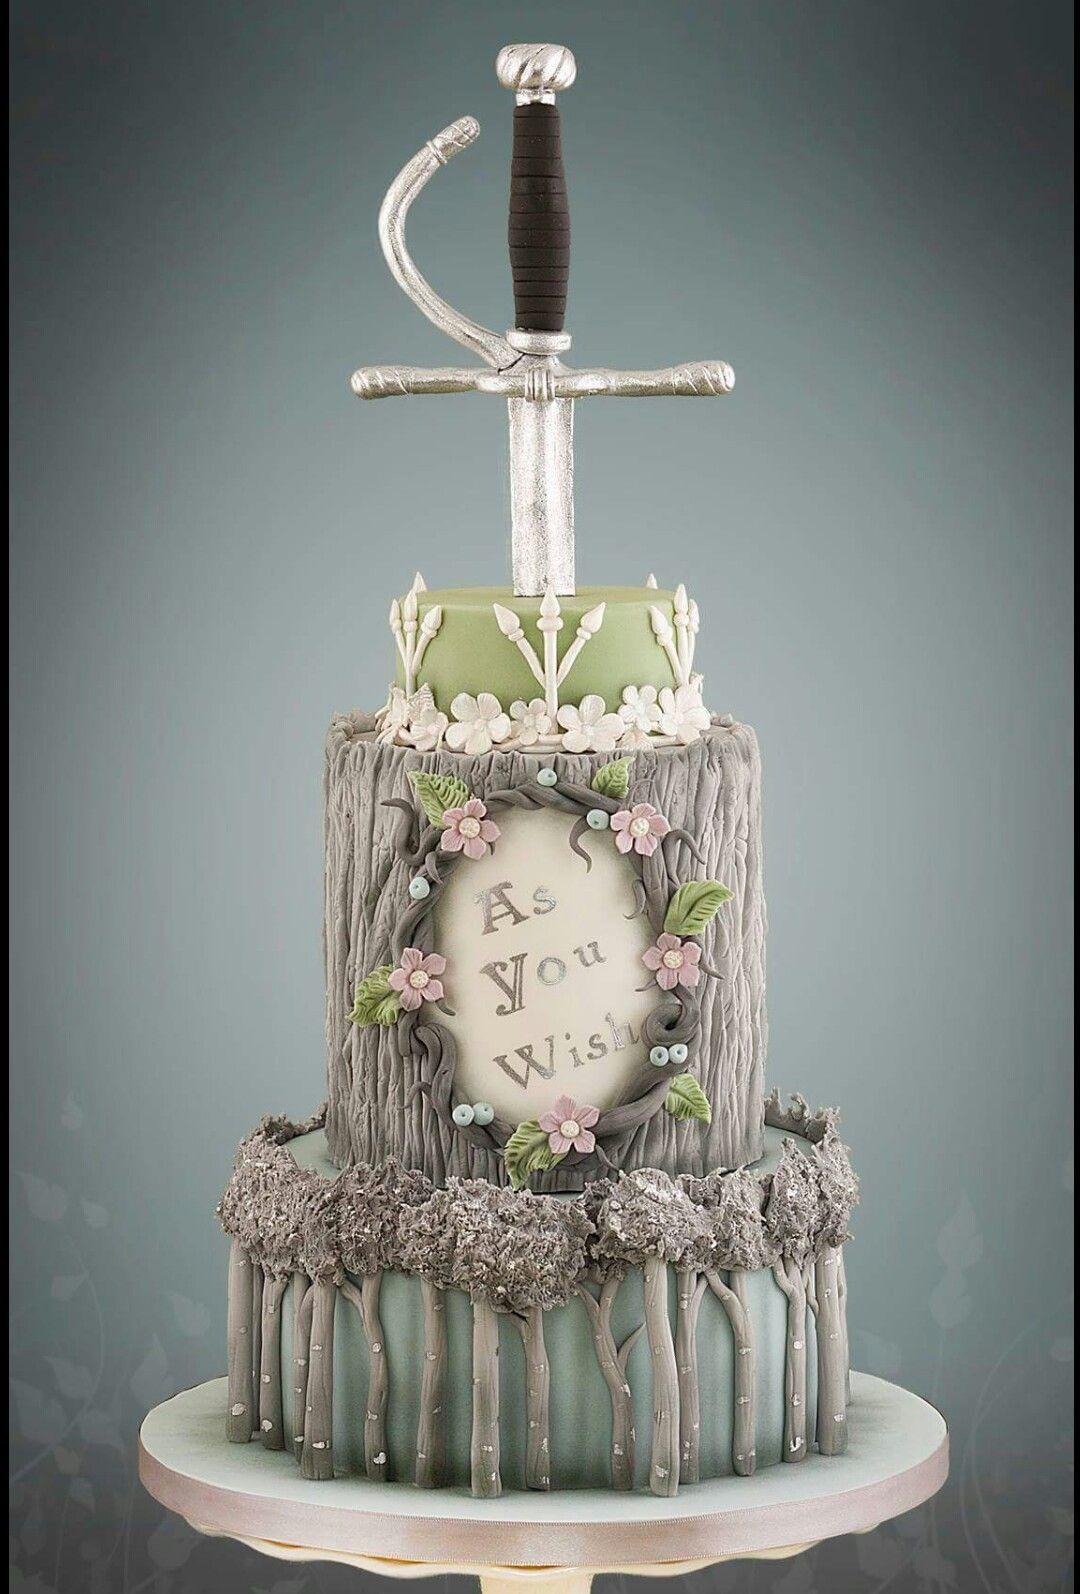 The Princess Bride 2 Awesome Cakes Cupcakes Pinterest Cake